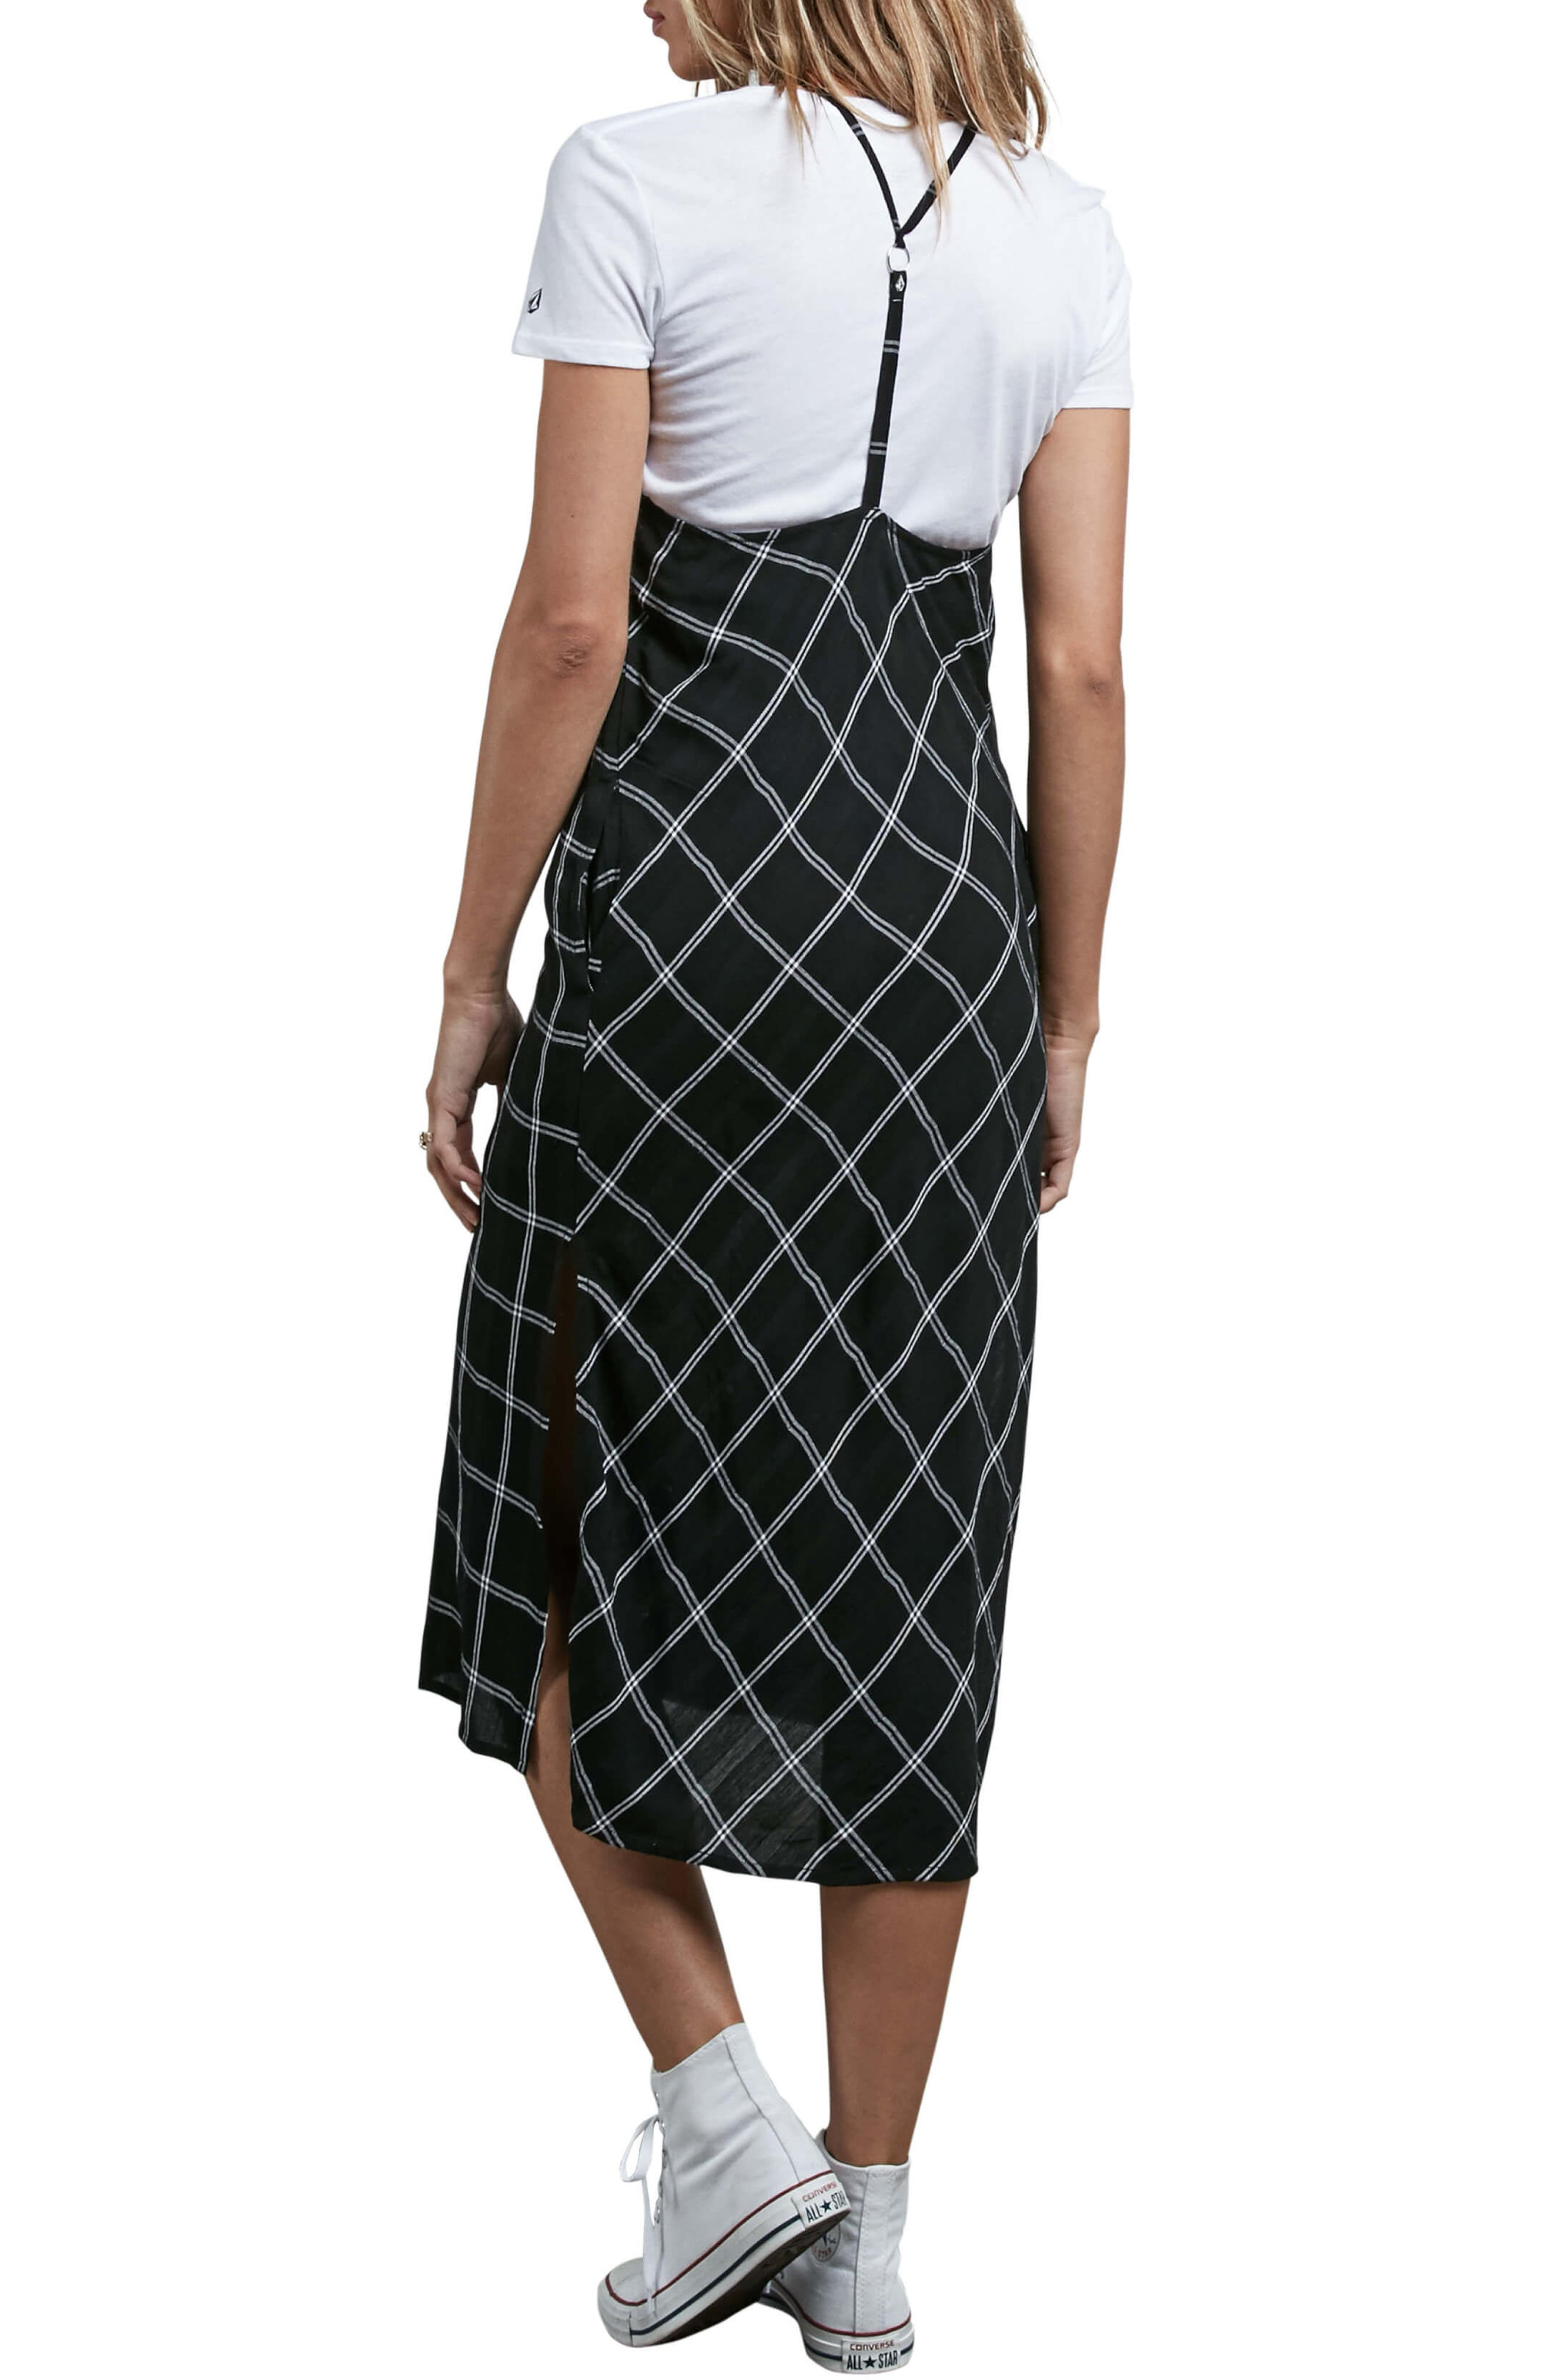 Jumponit Windowpane Print Midi Dress,                             Alternate thumbnail 2, color,